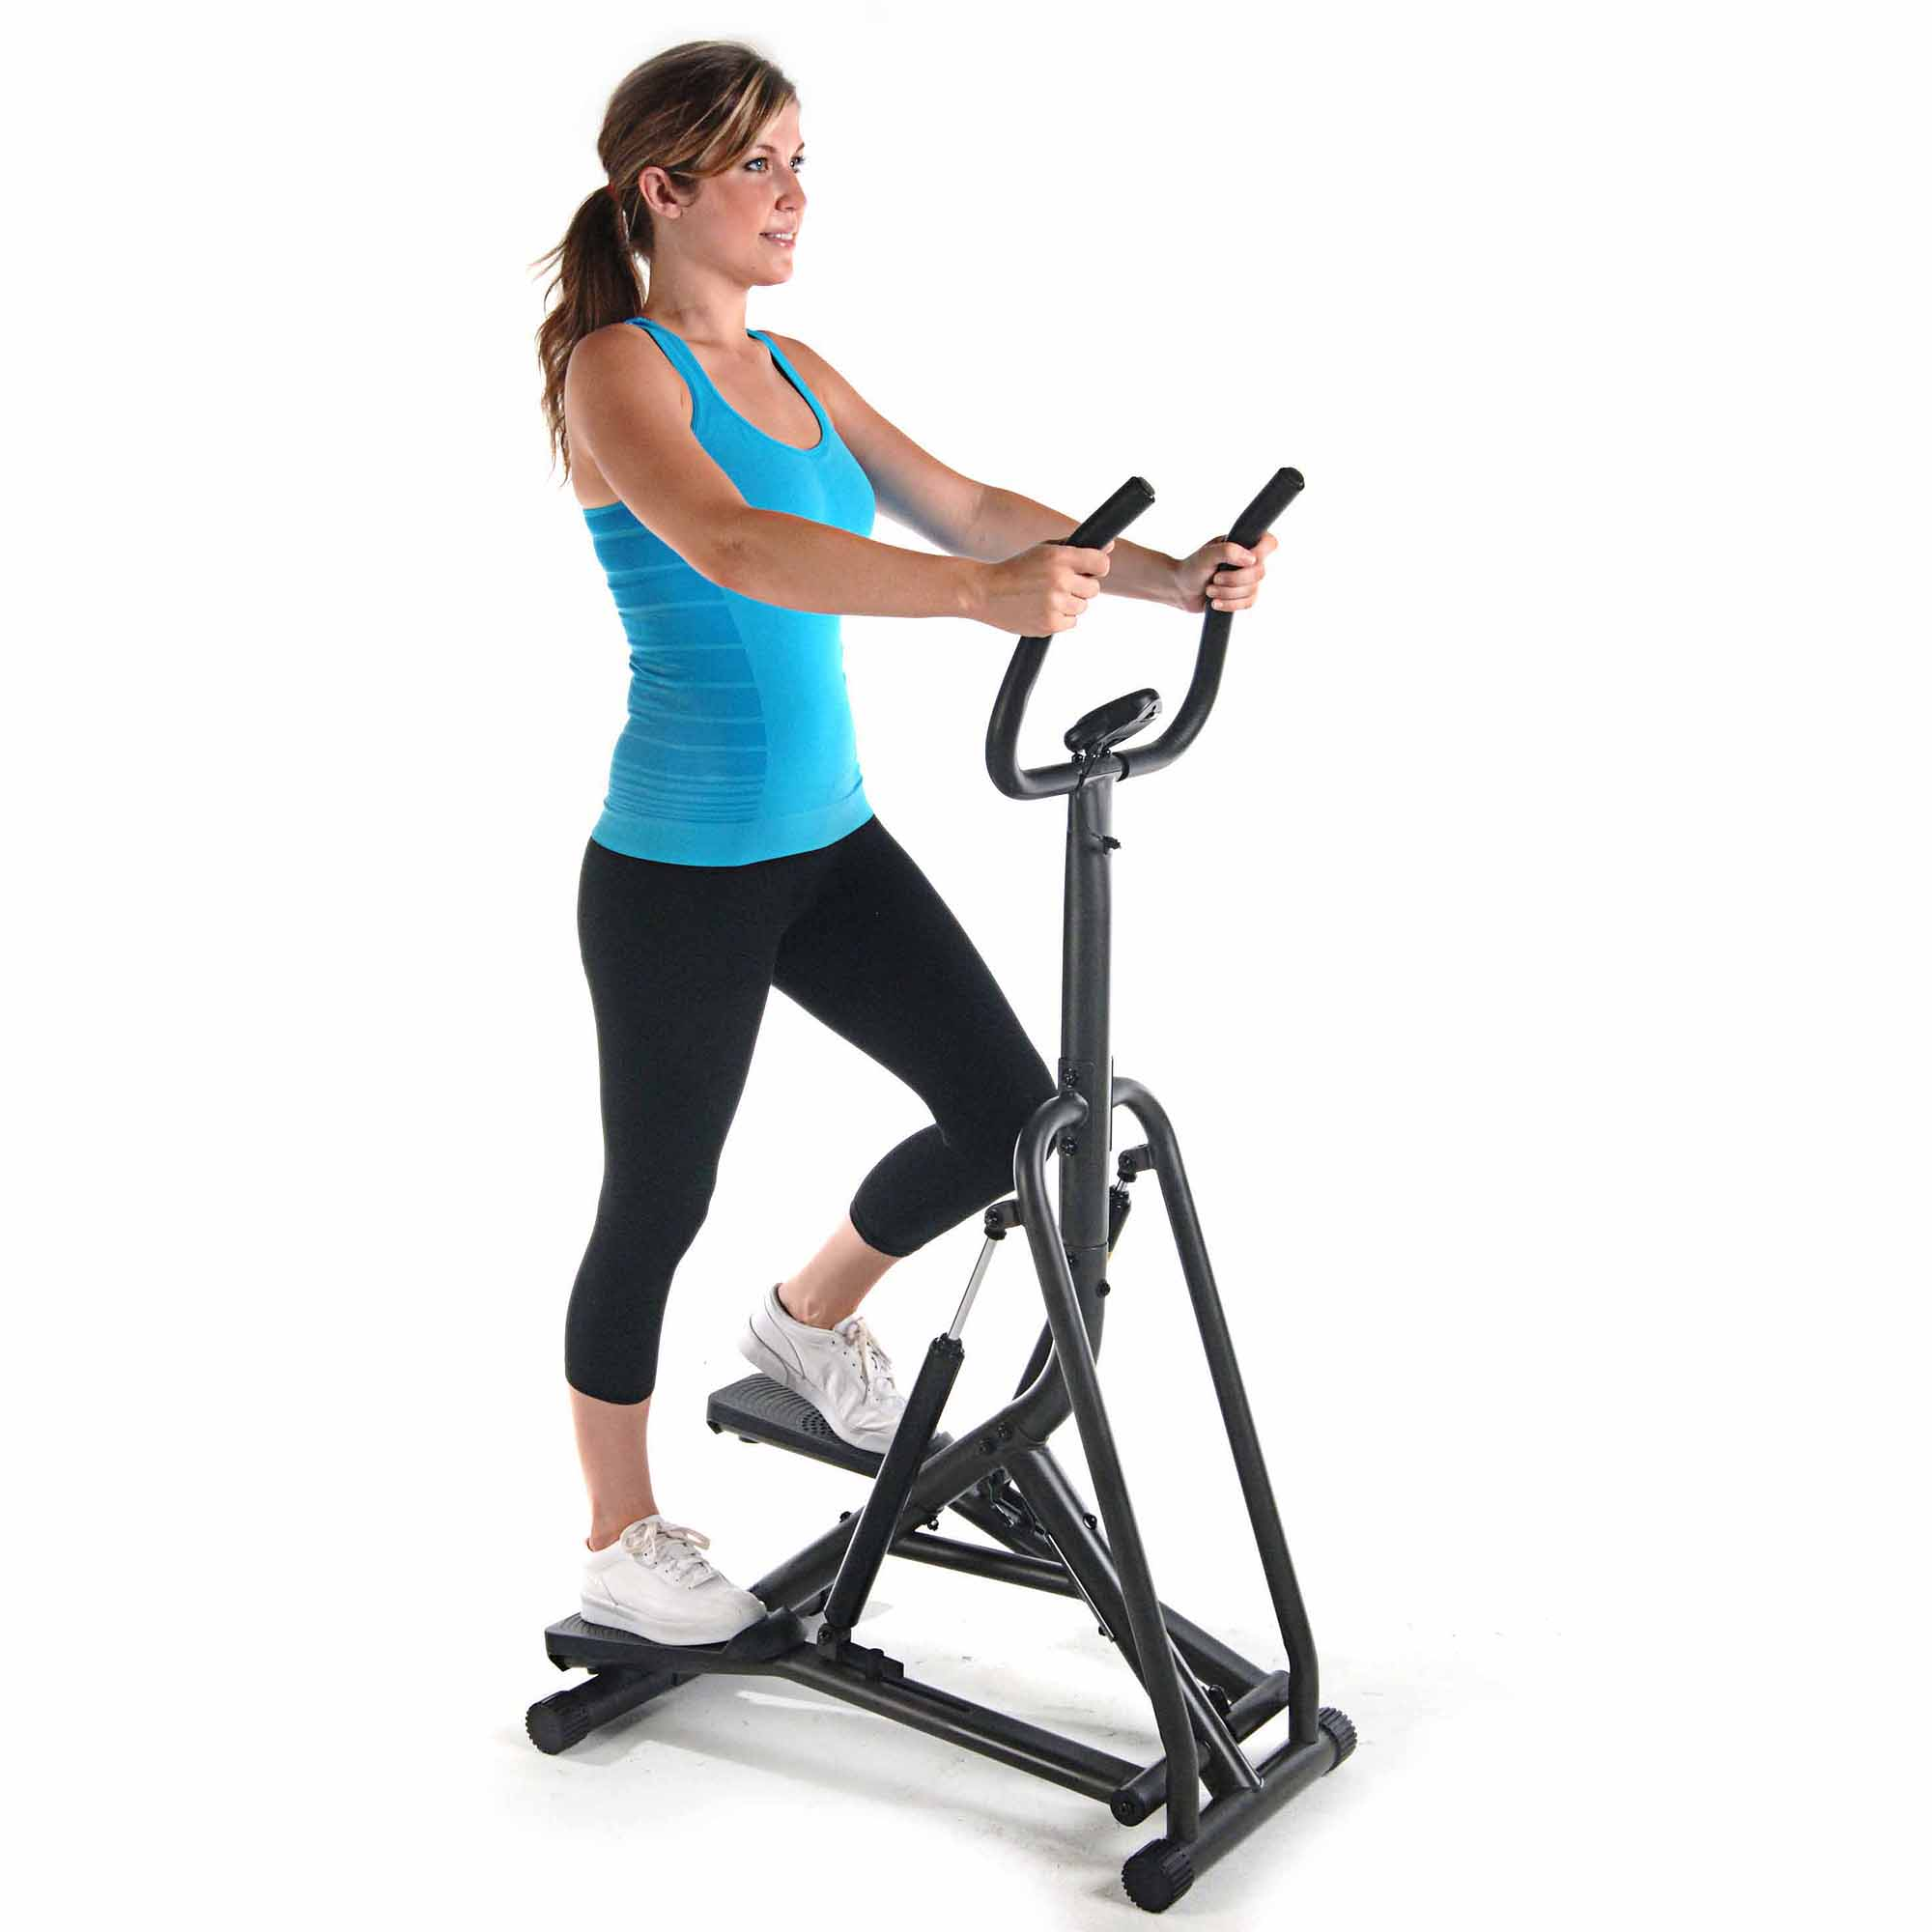 Home Exercise Equipment Stepper: Steppbrett Home Aerobic XL Premium Inkl. Workout Fitness